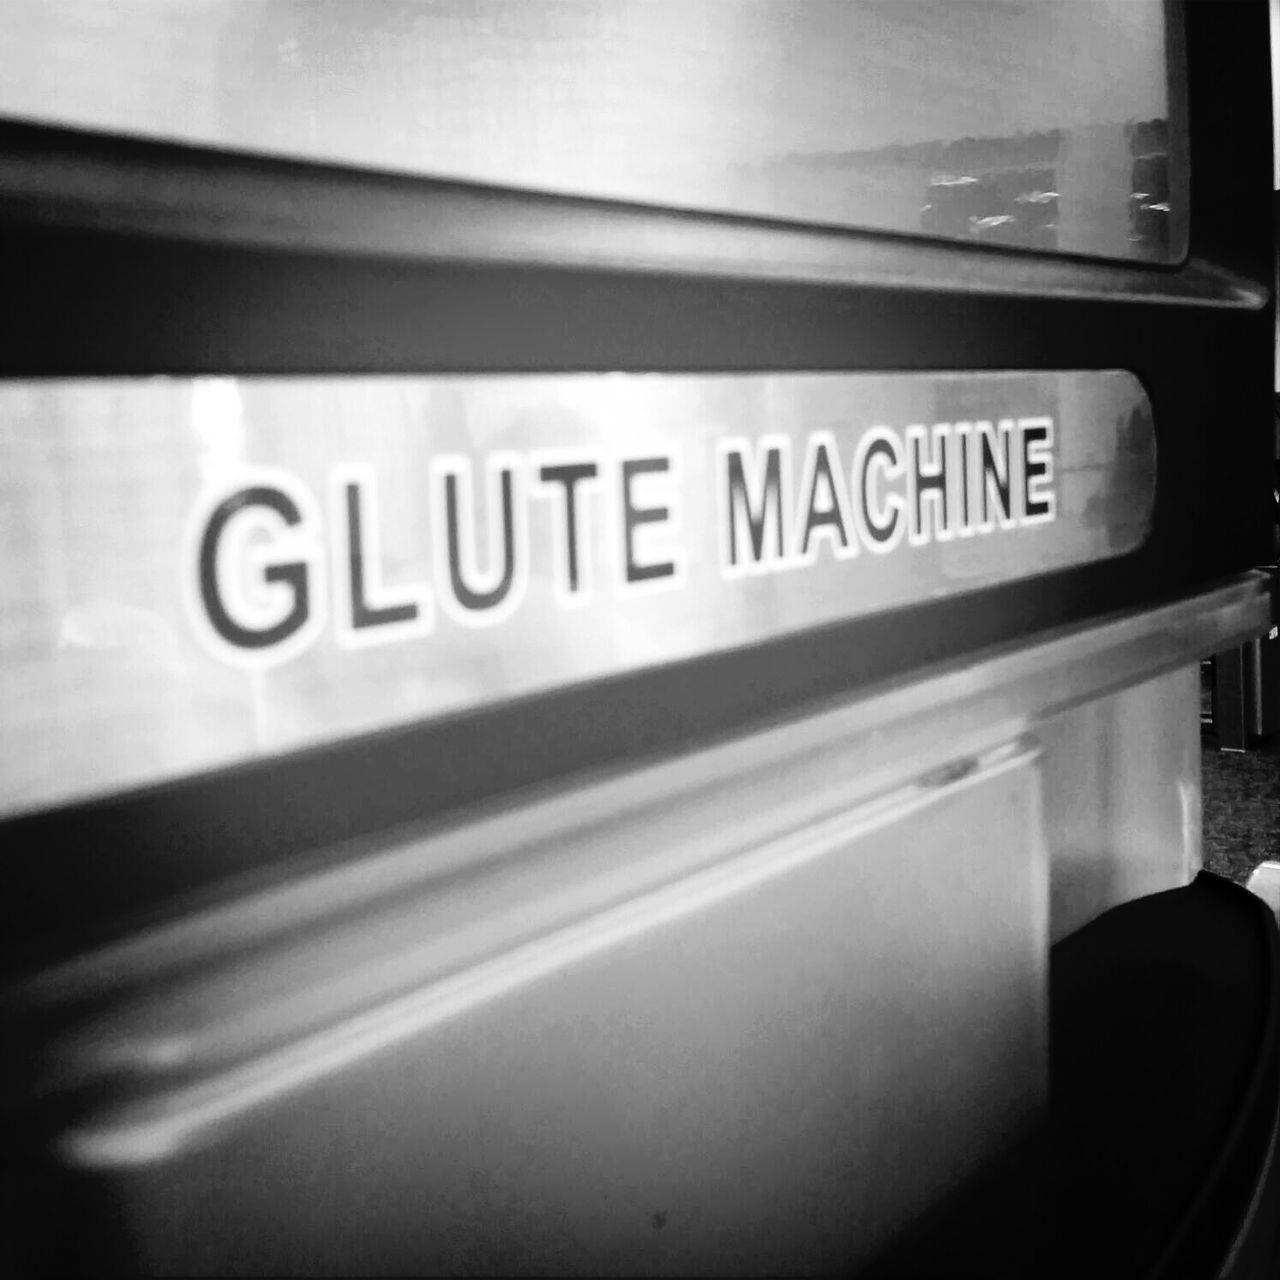 Gym Workout Glute Black & White